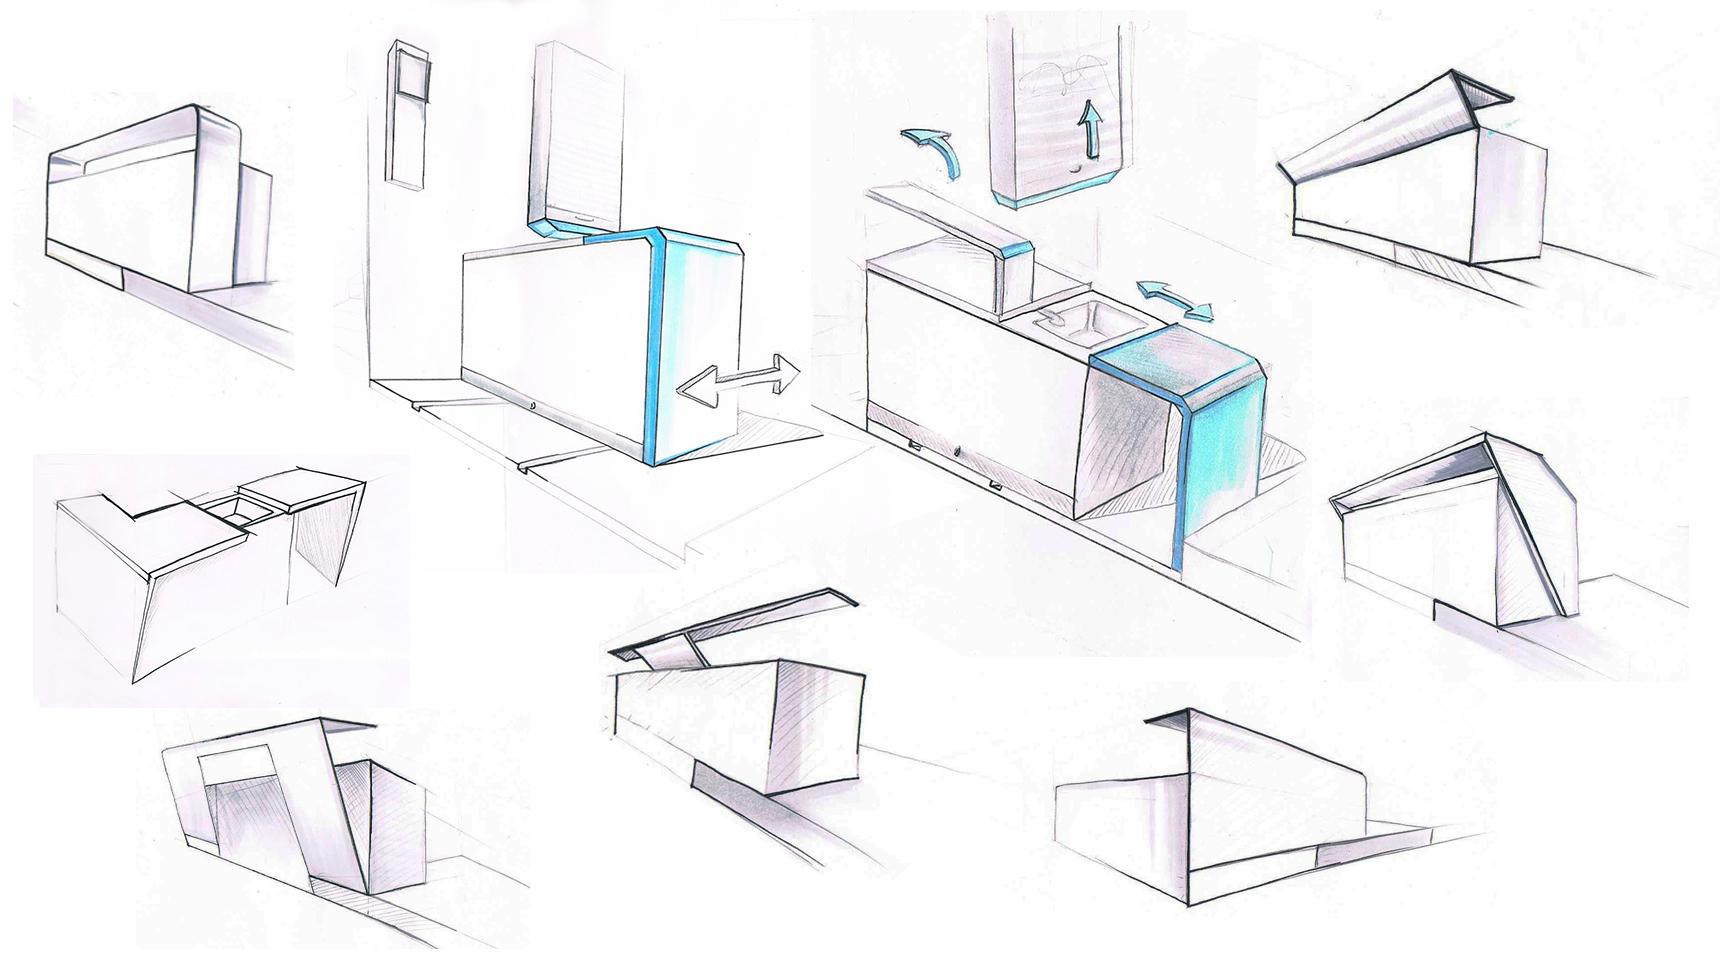 Christine-Sperle- Produktdesign - Fabbus Theke